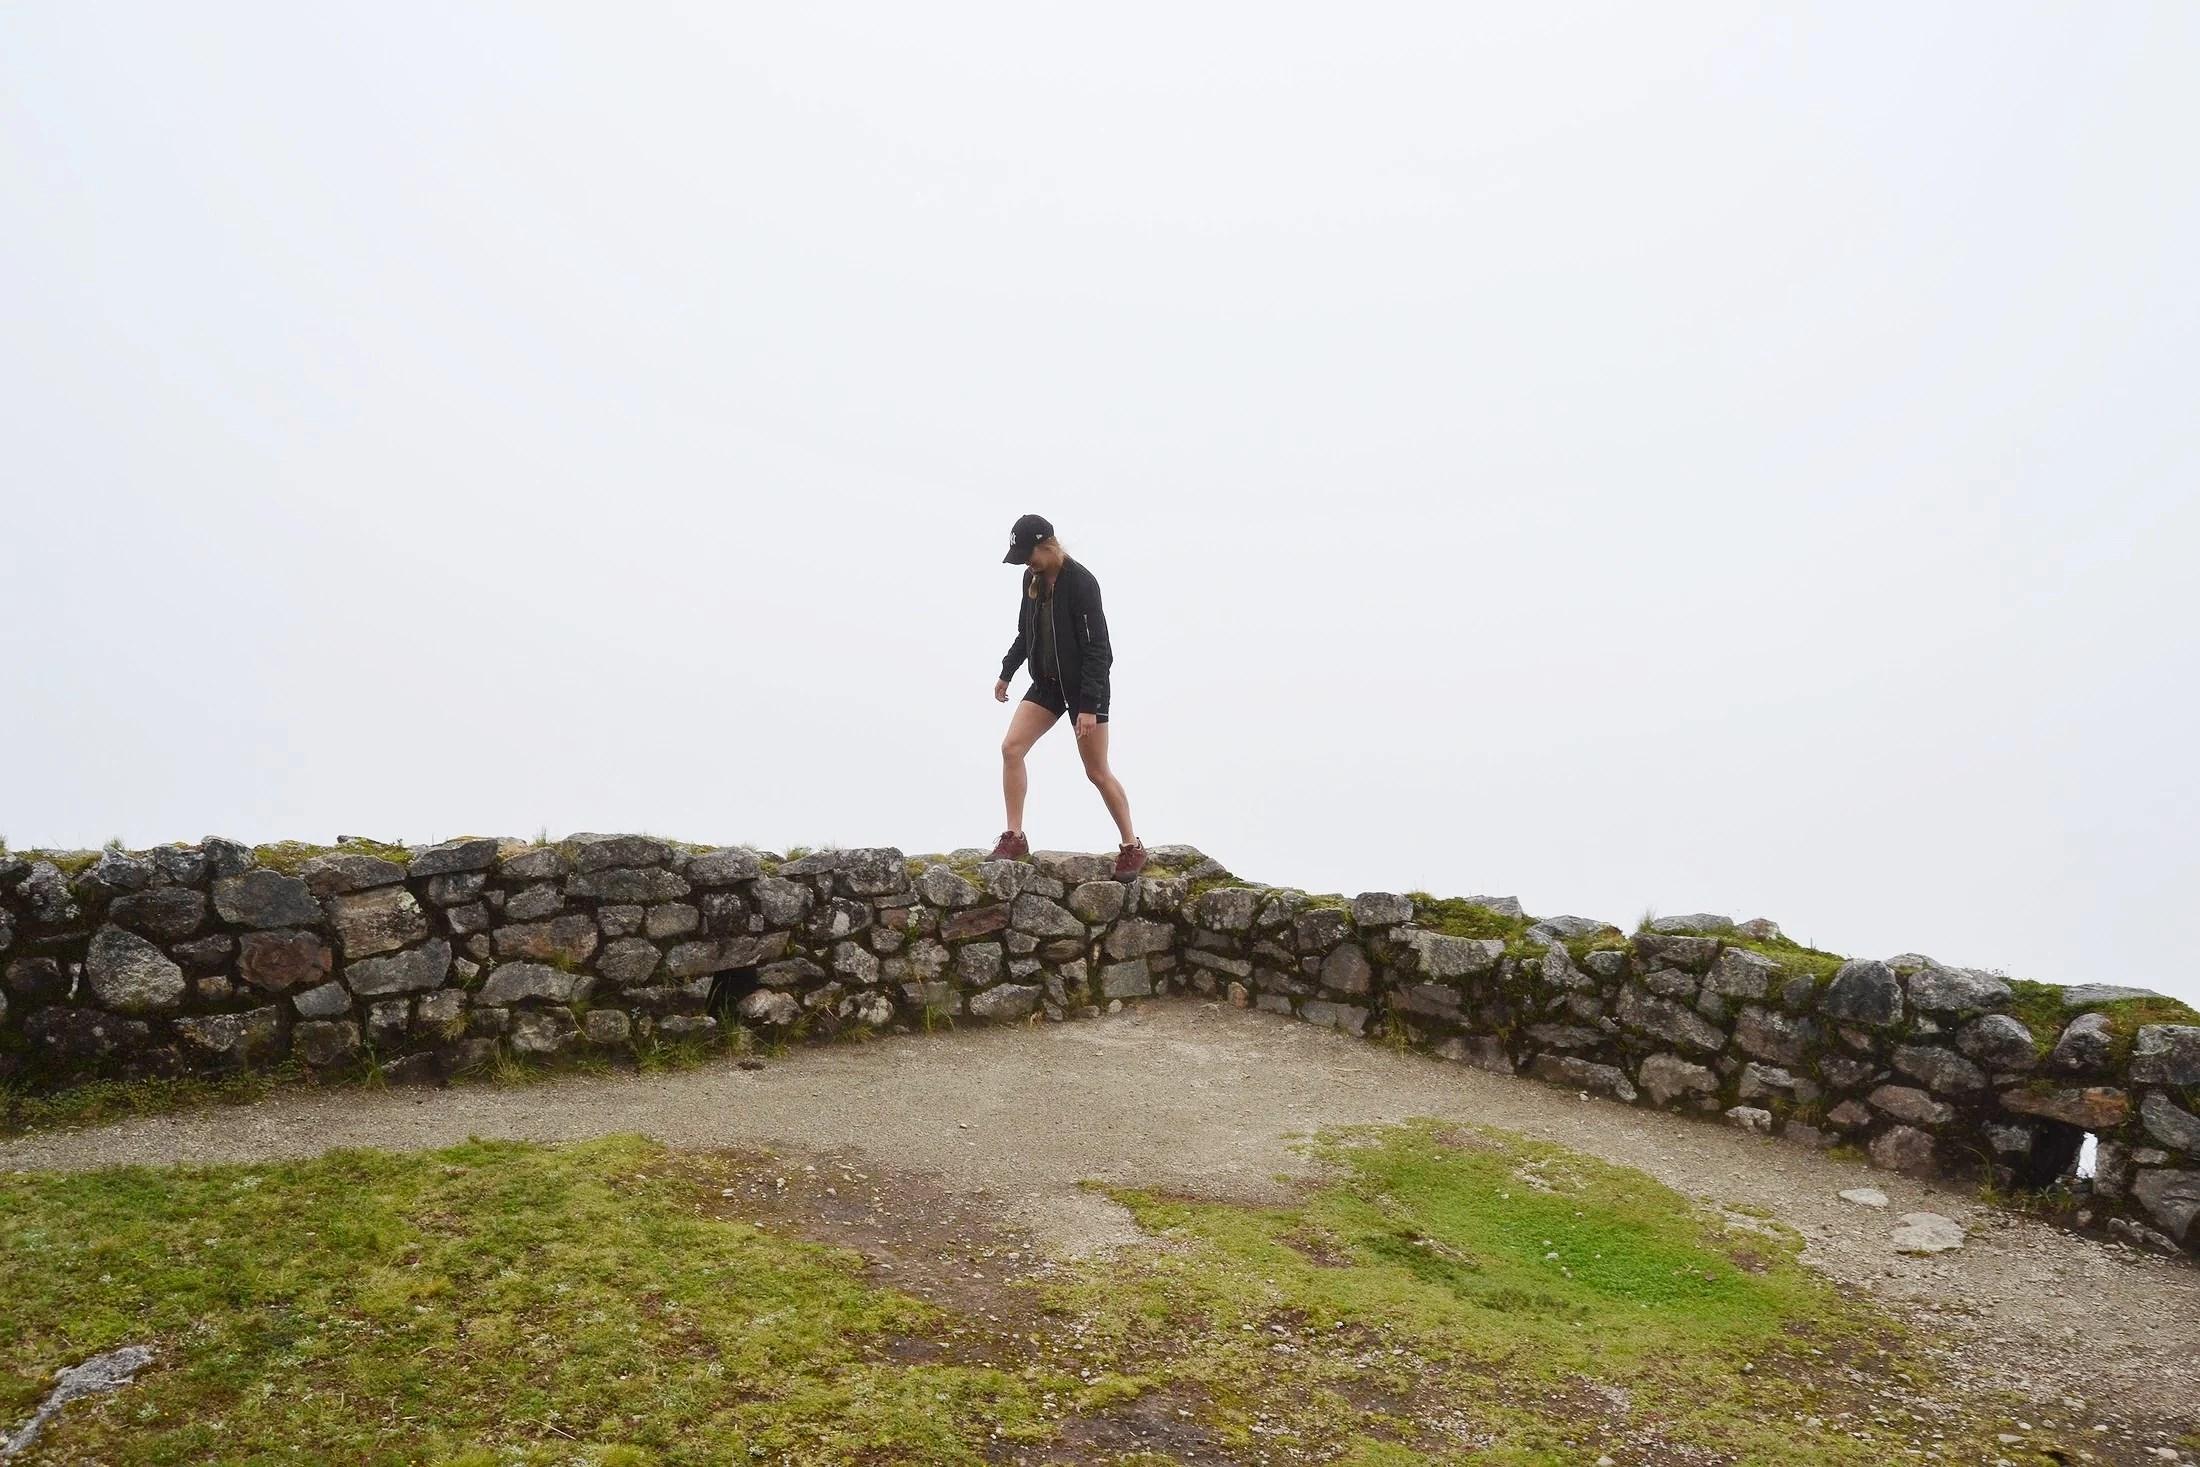 Walking on an edge